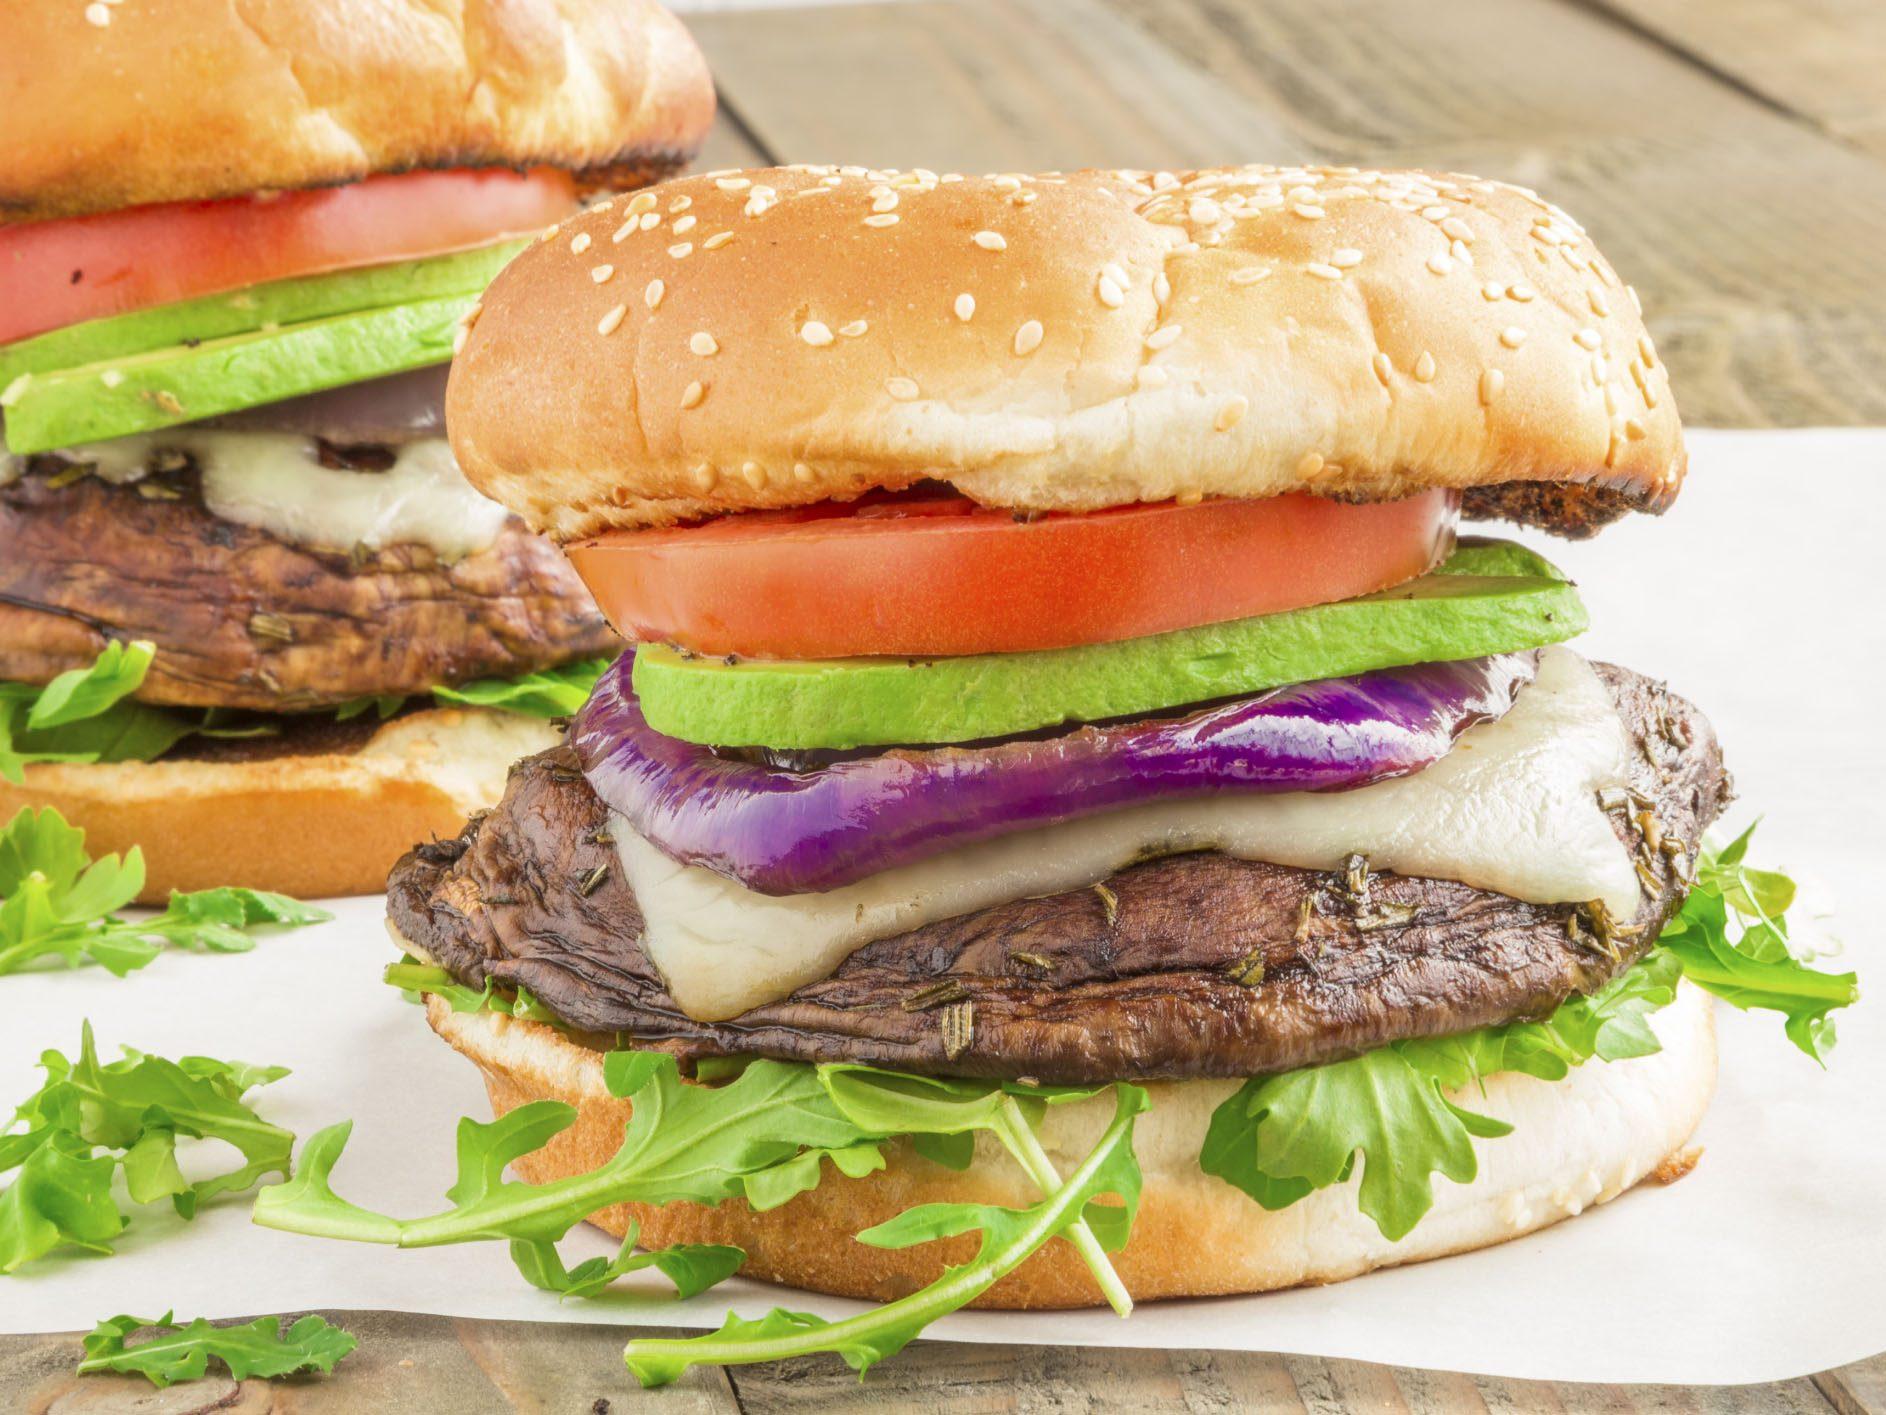 Recipe: Portobello Mushroom Burgers